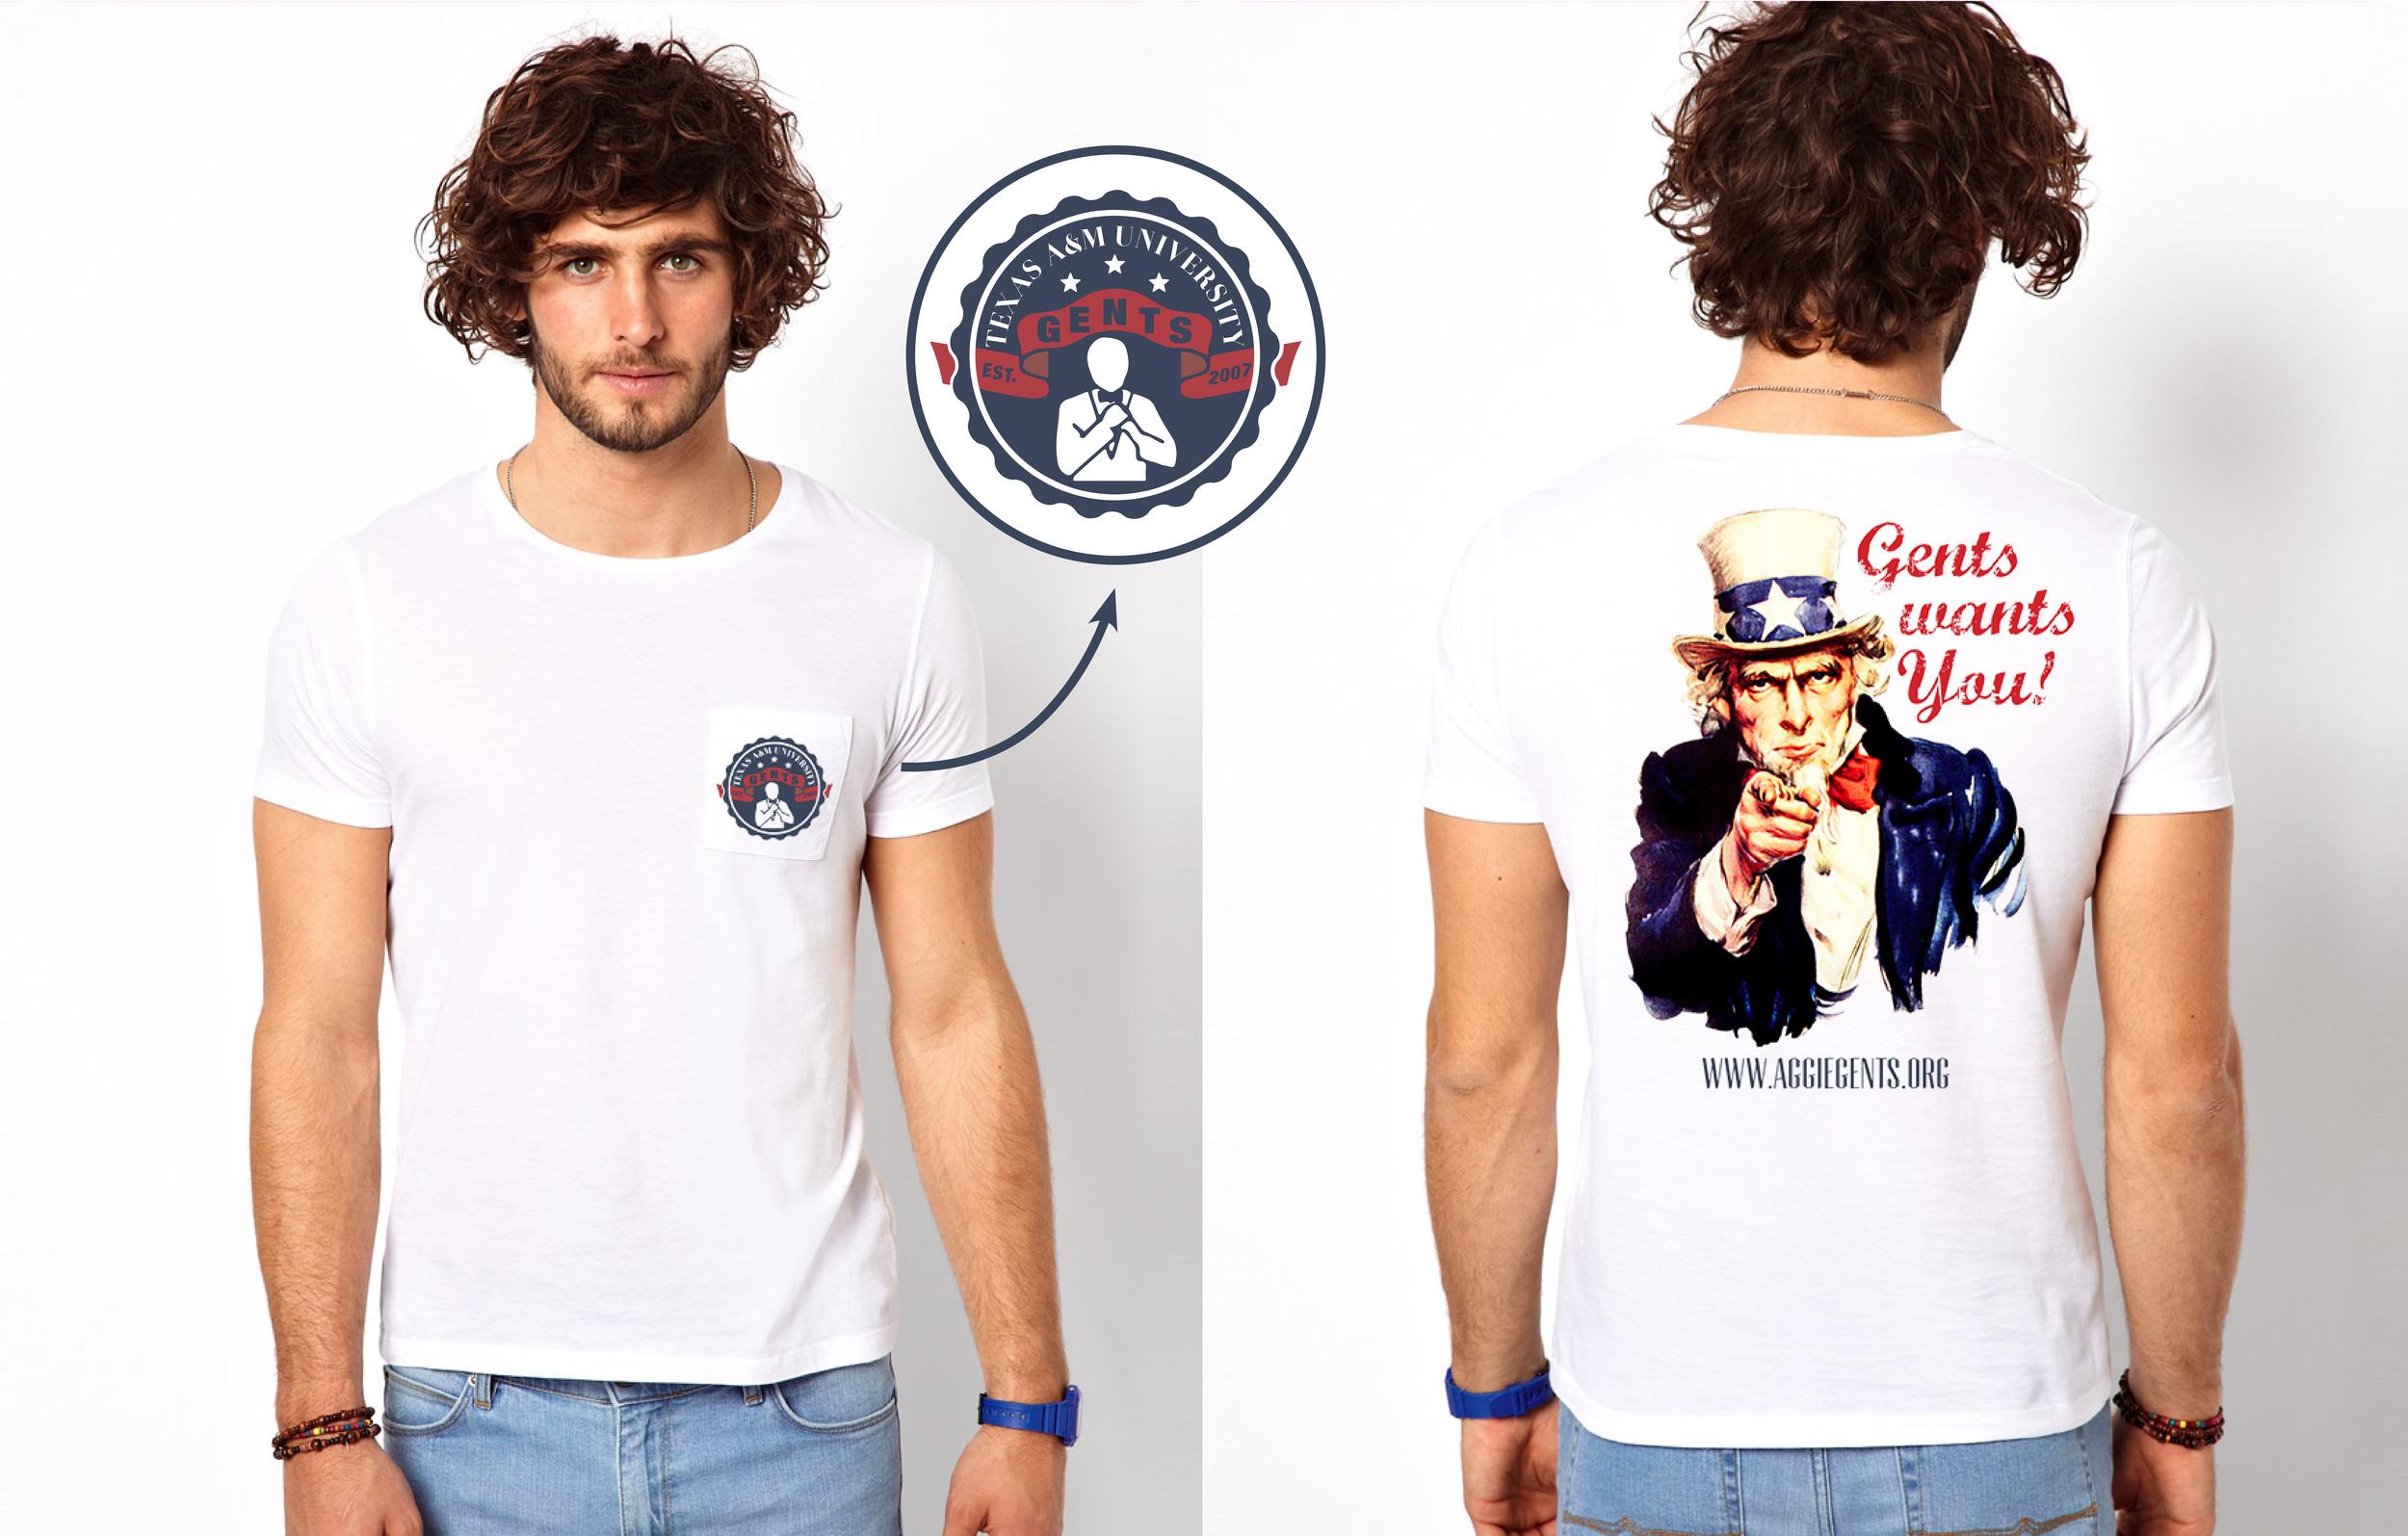 Gents_Wants_You_T-shirt2.jpg